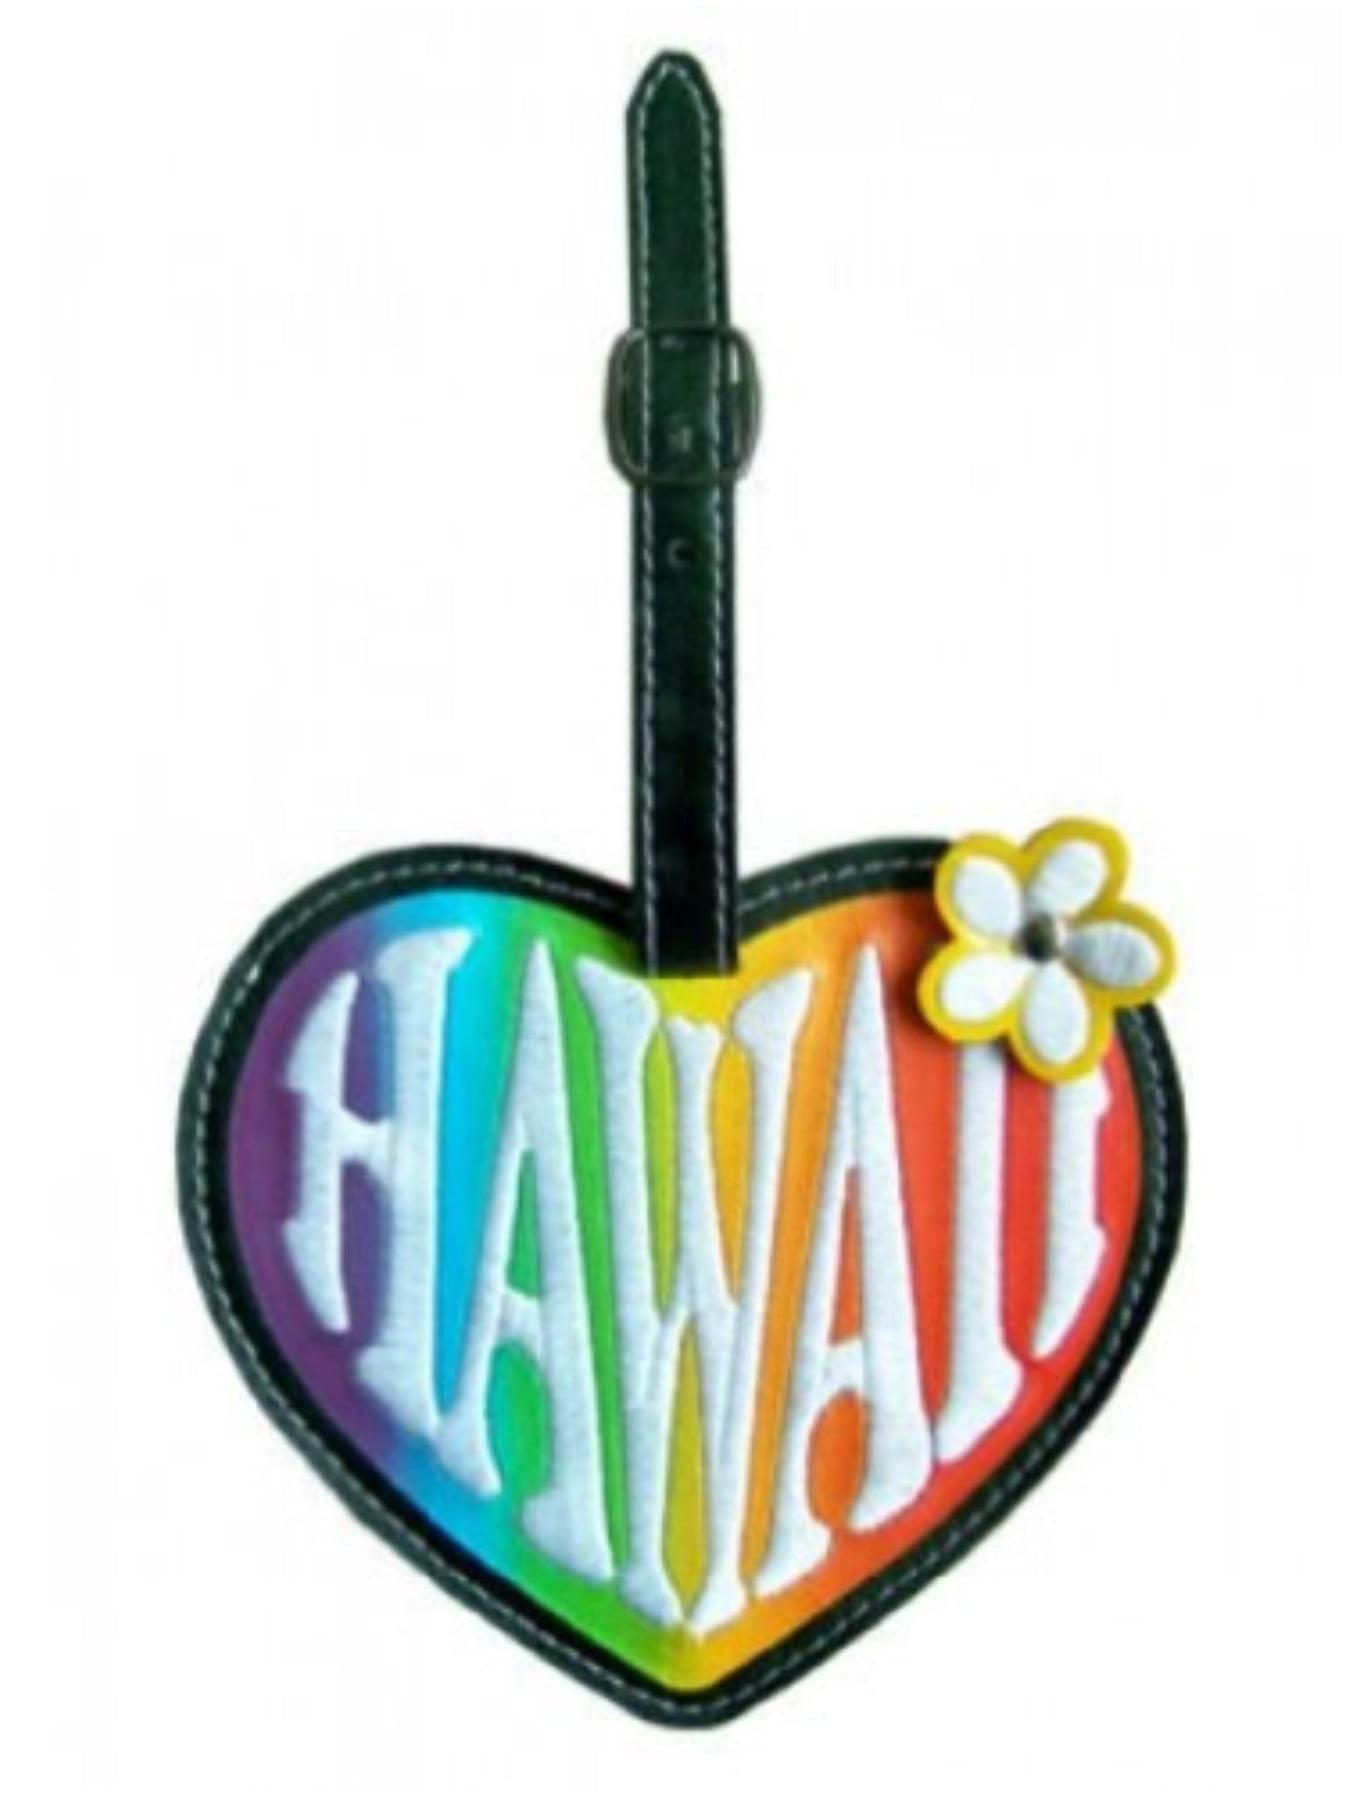 KC Hawaii Luggage Tag Vinyl Heart Black, Orange, Yellow